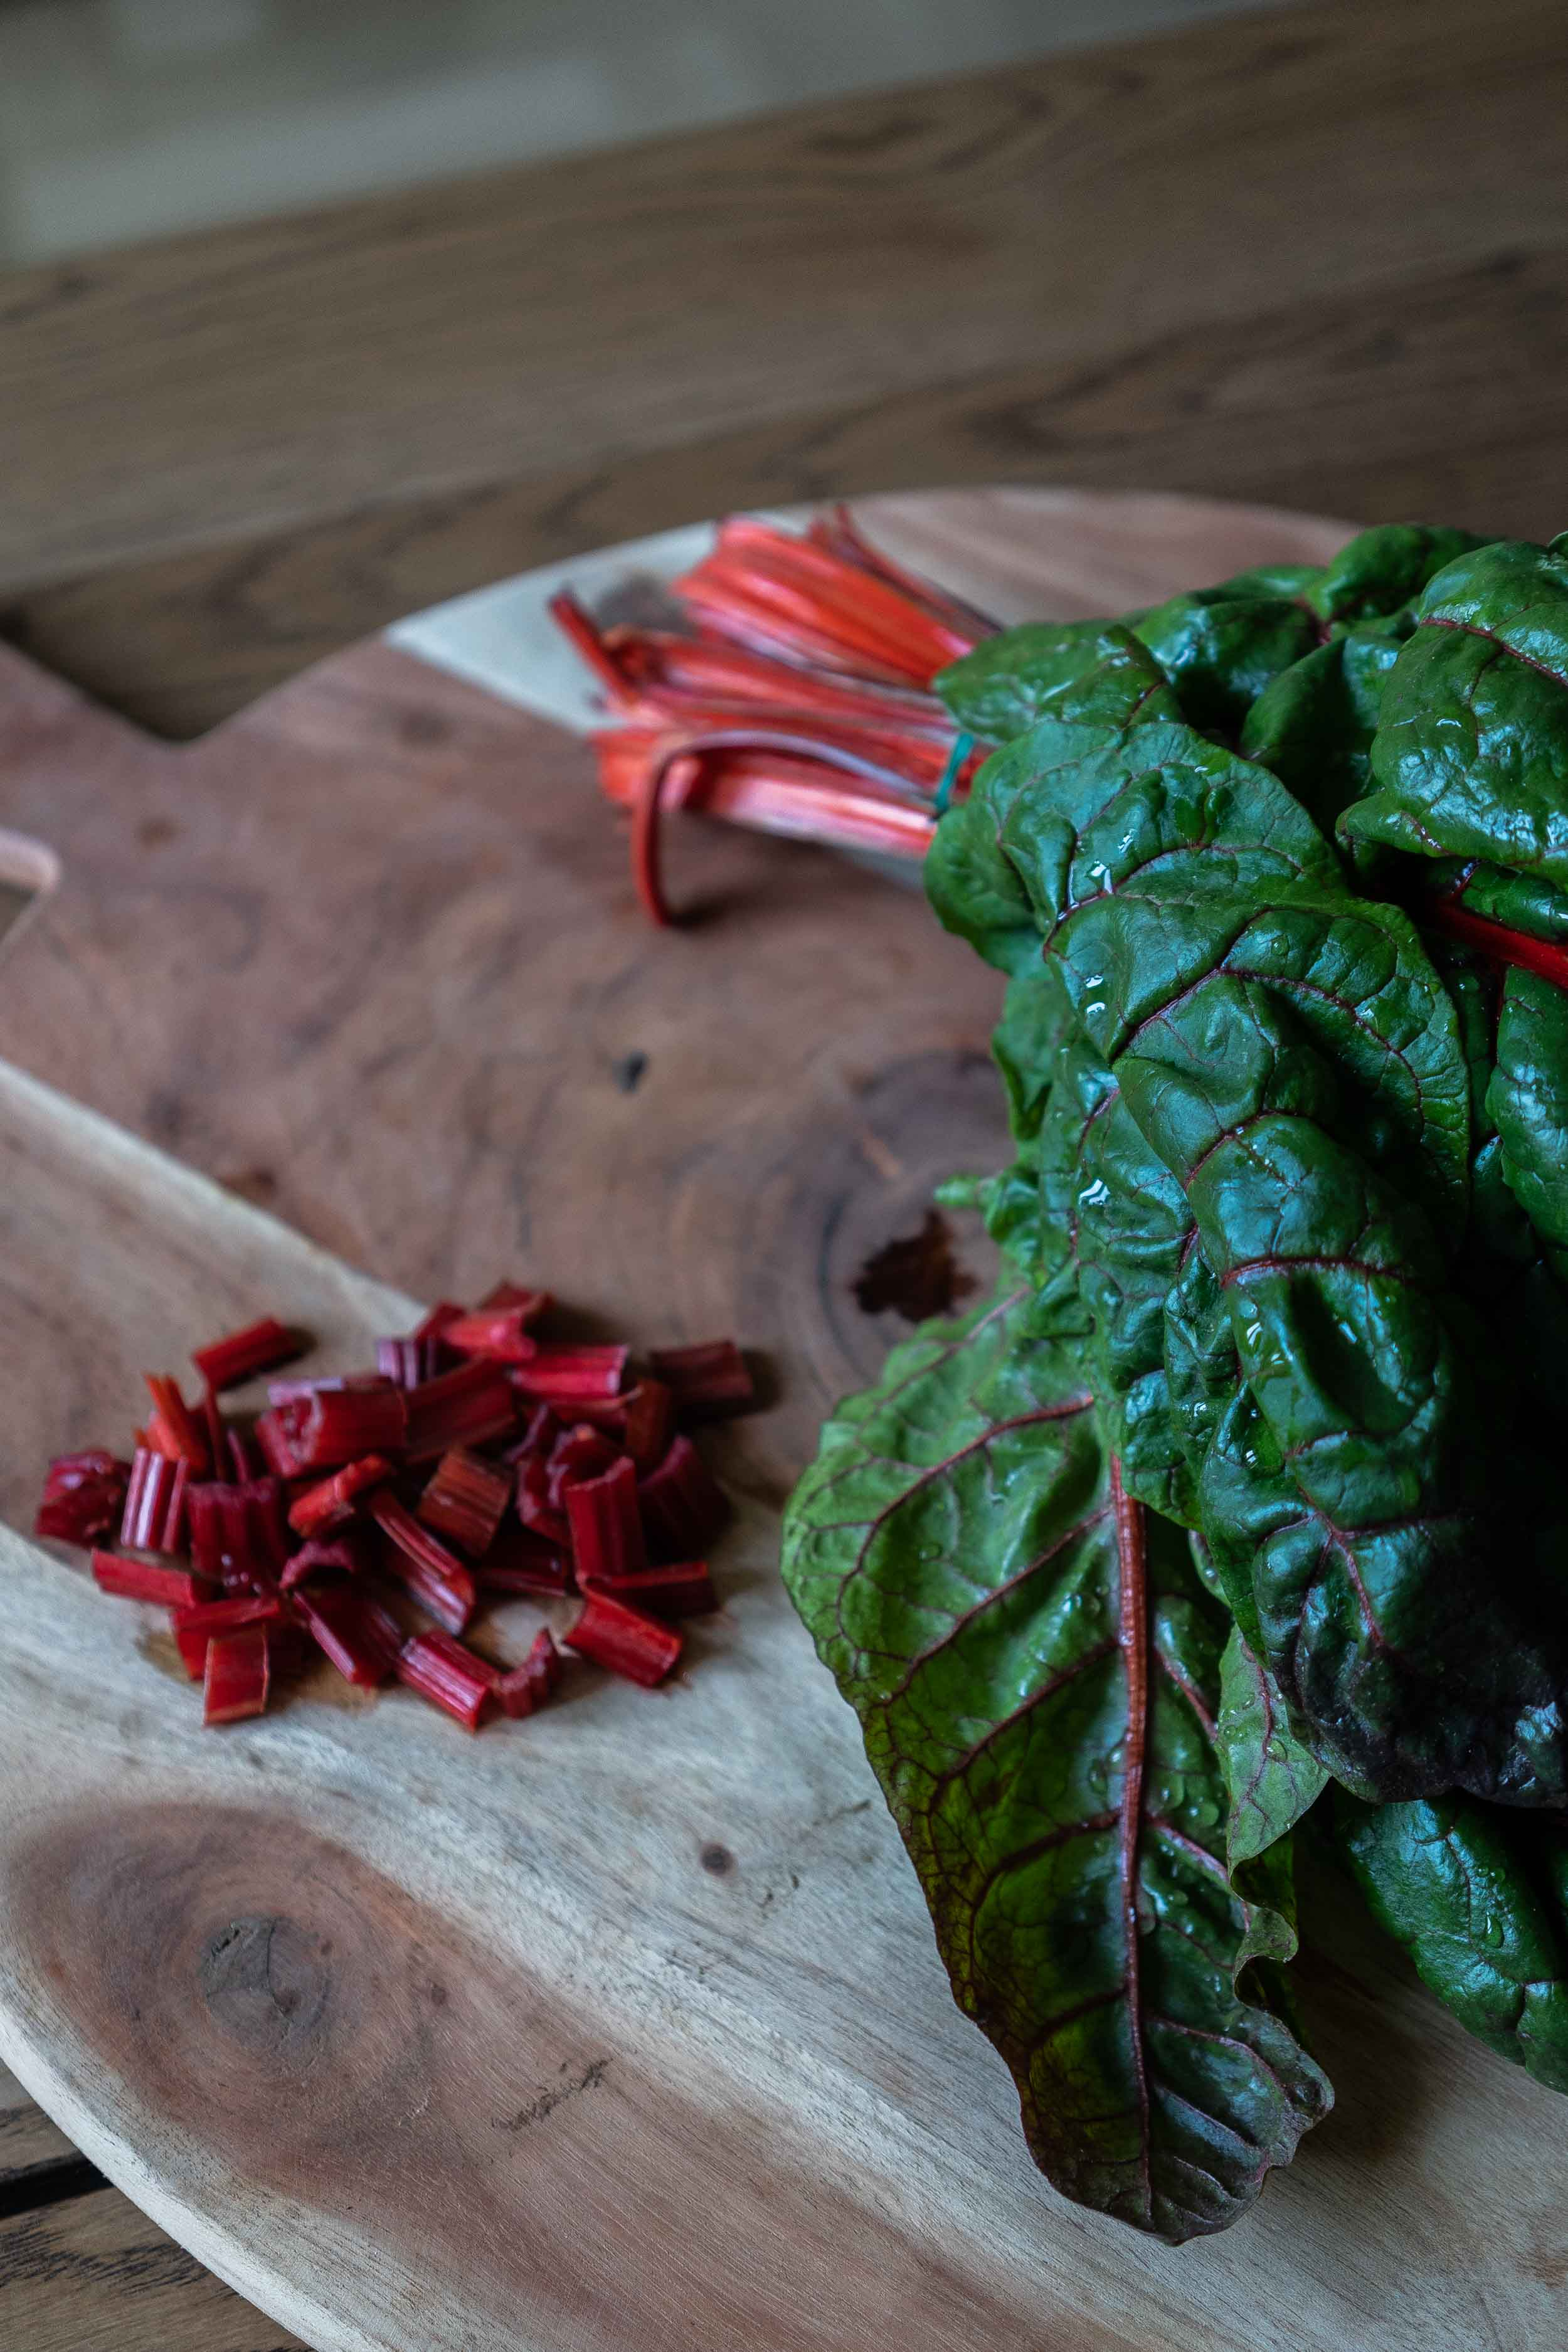 Rhubarb-Jam-with-cardamom-and-ginger-05048.jpg